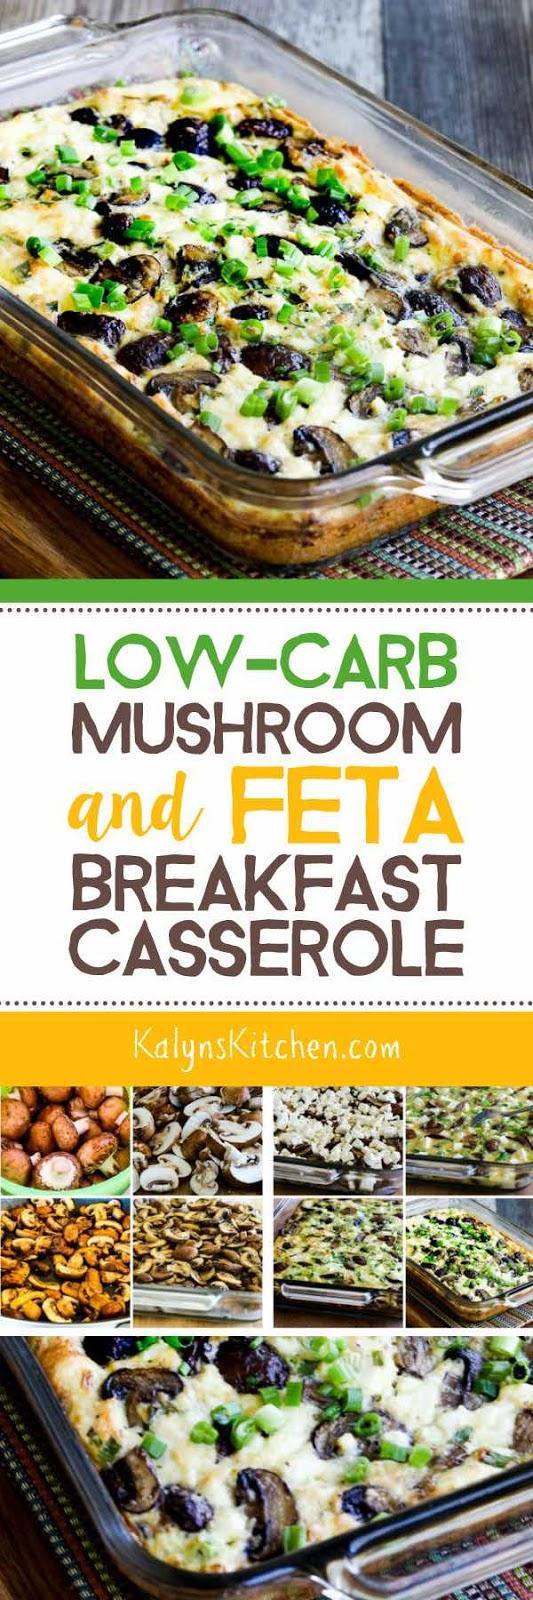 Low-Carb Mushroom and Feta Breakfast Casserole found on KalynsKitchen ...